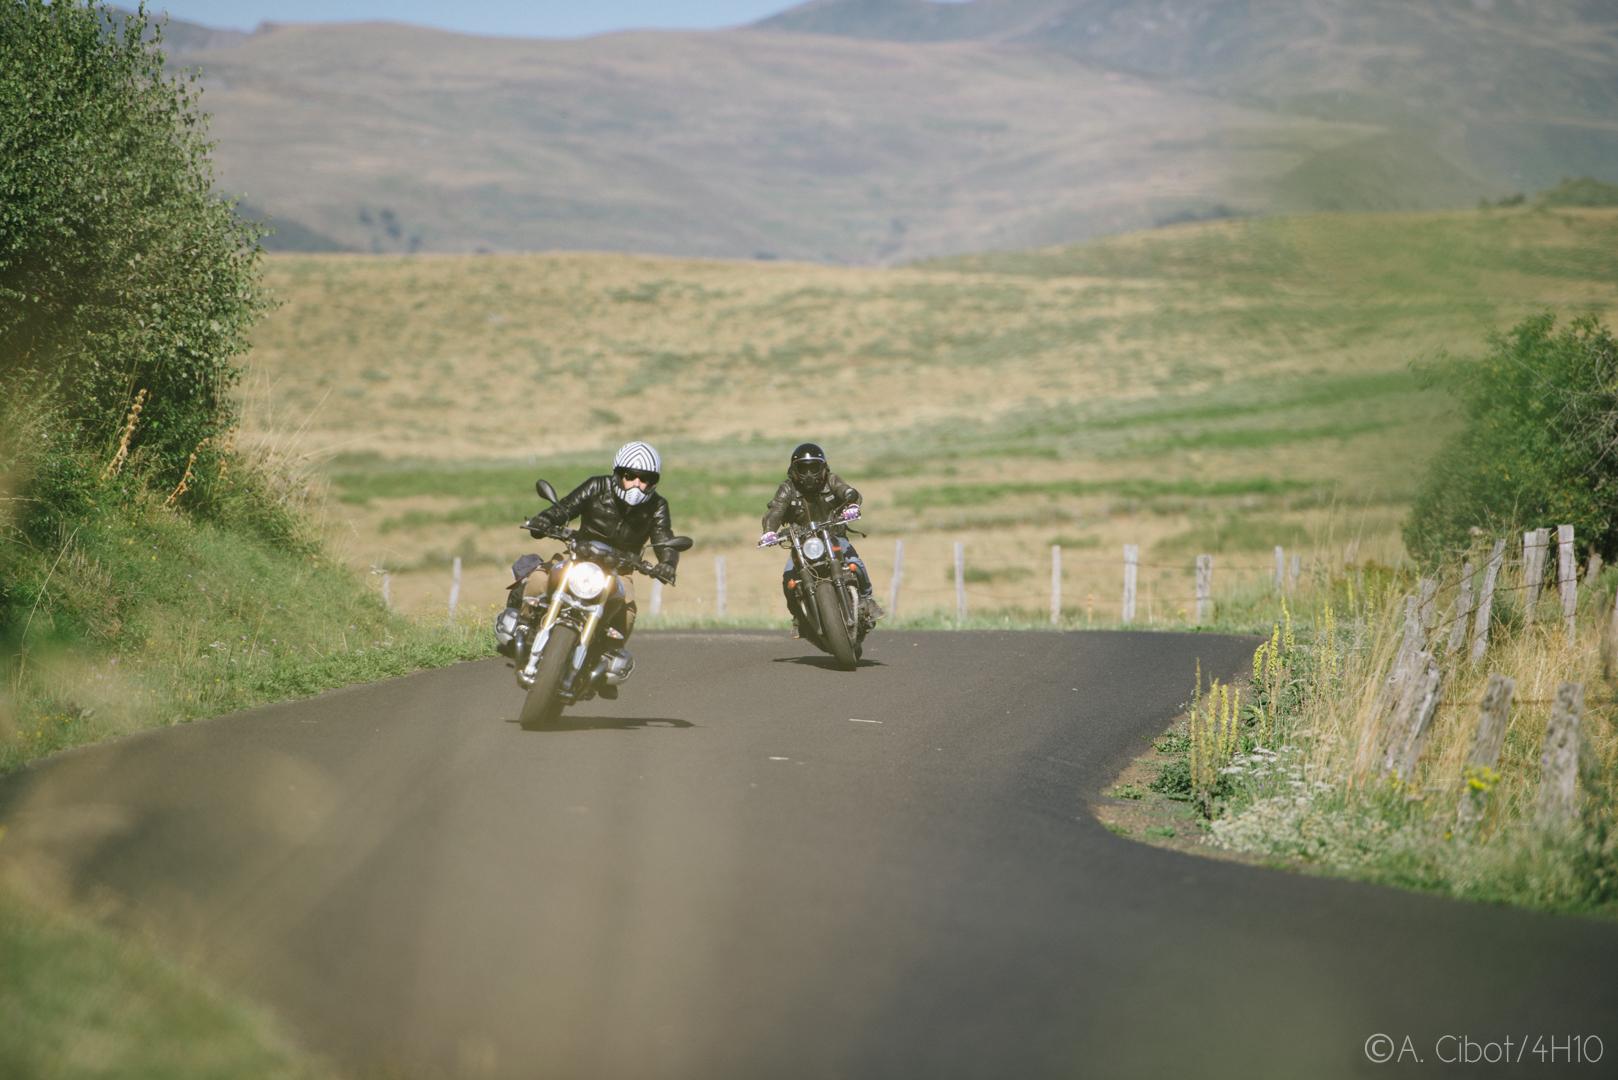 roadtrip-moto-auvergne-saint-flour-cantal-ballade-itineraire-4h10-ninety-scrambler11